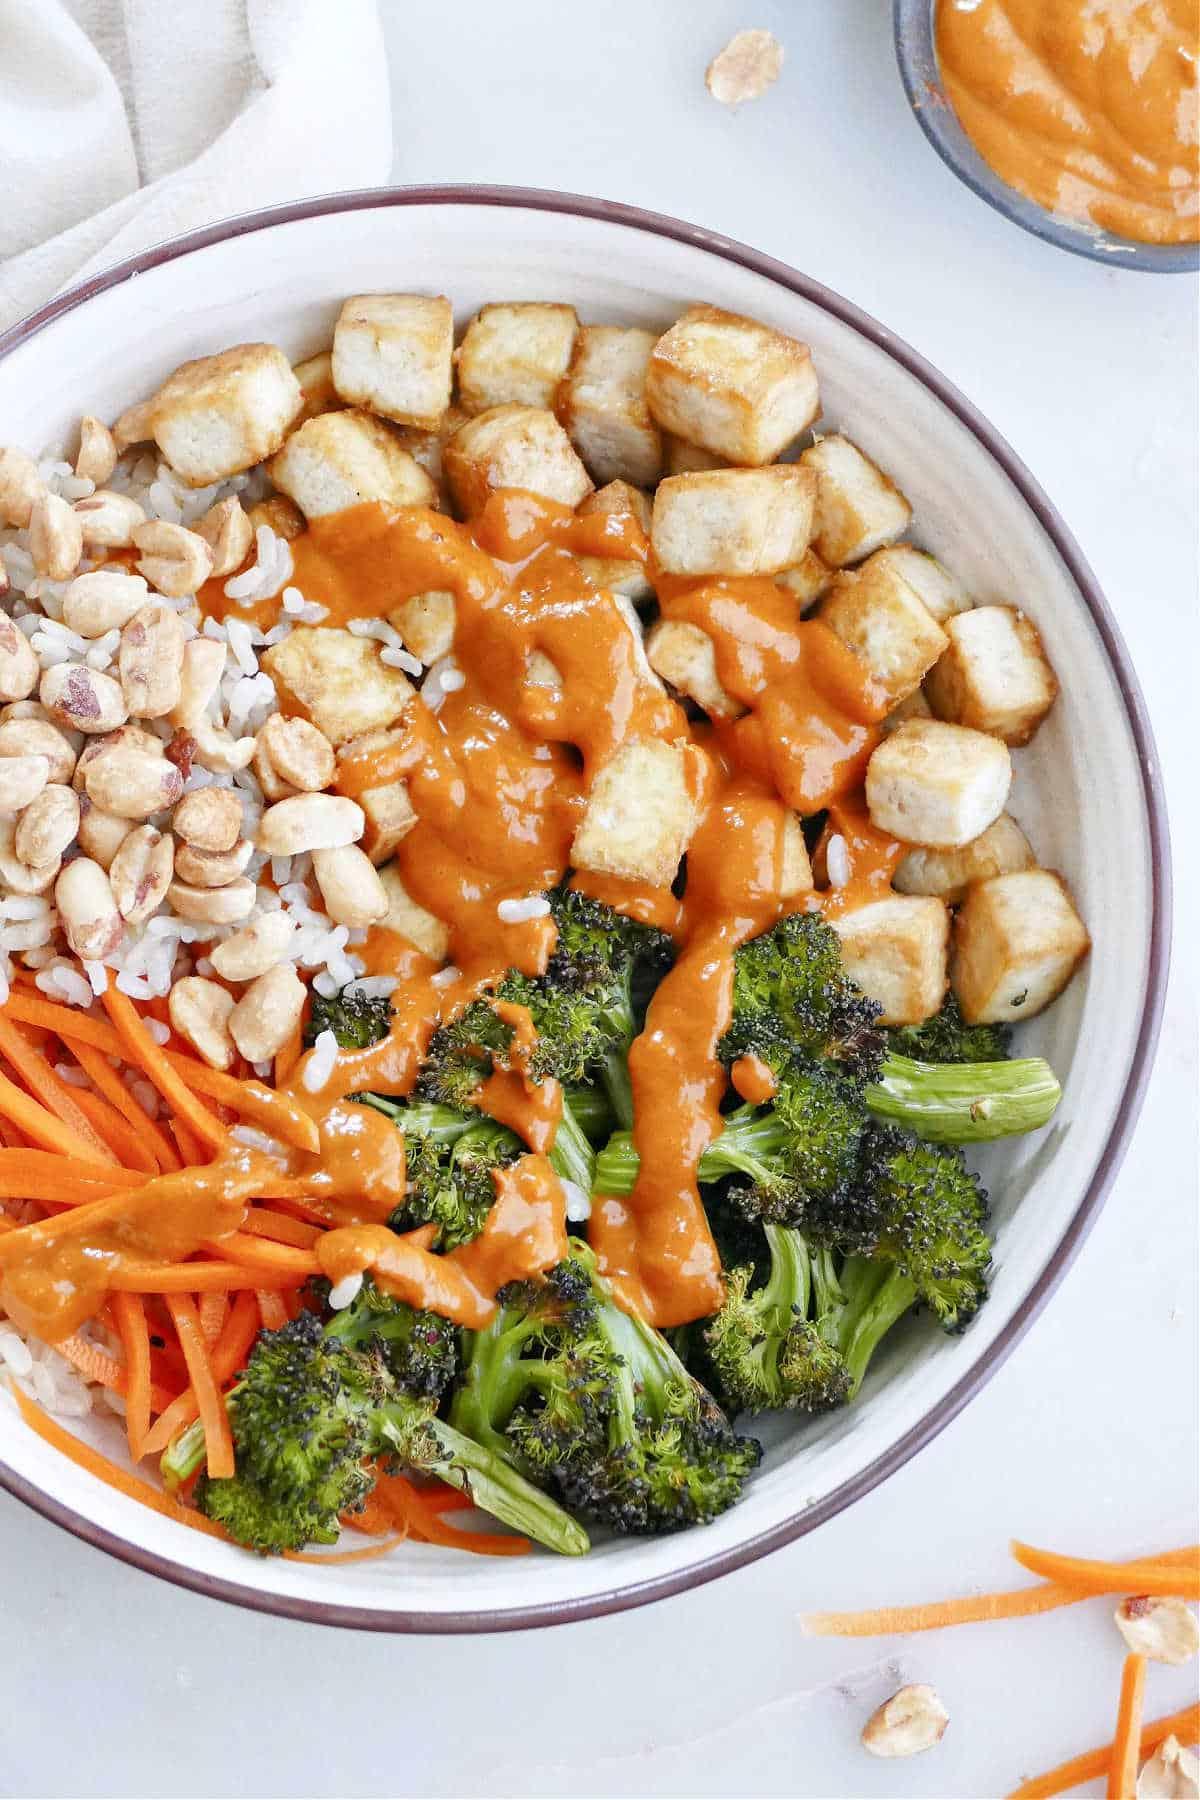 tofu buddha bowl with peanut sauce, rice, and veggies on a counter